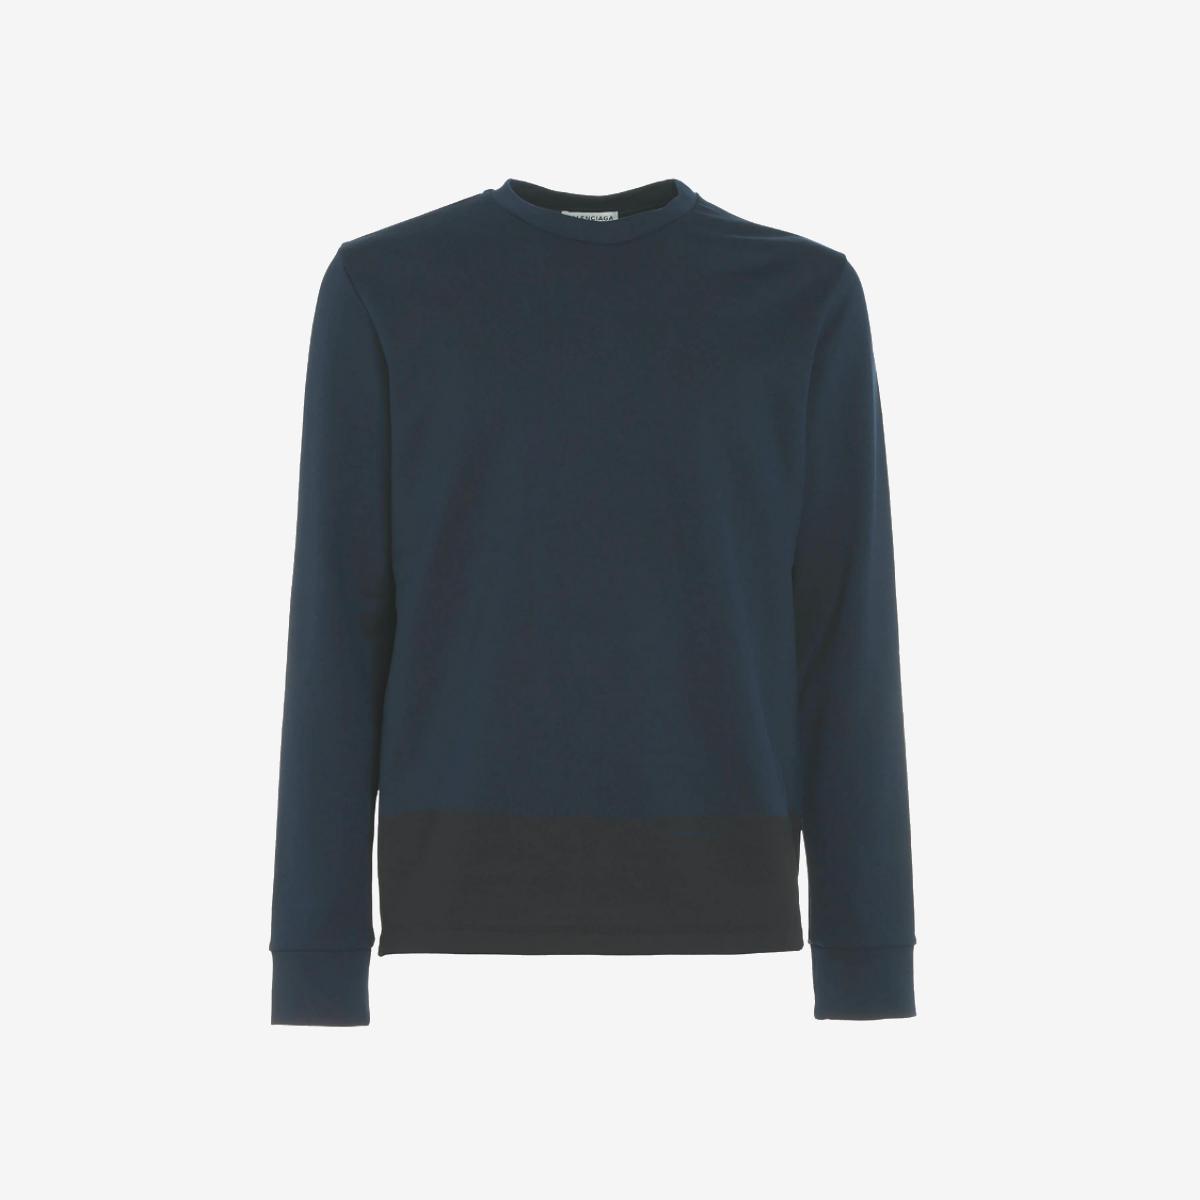 Balenciaga Printed Sweatshirt - Dark Blau - rotUCED WAS  NOW